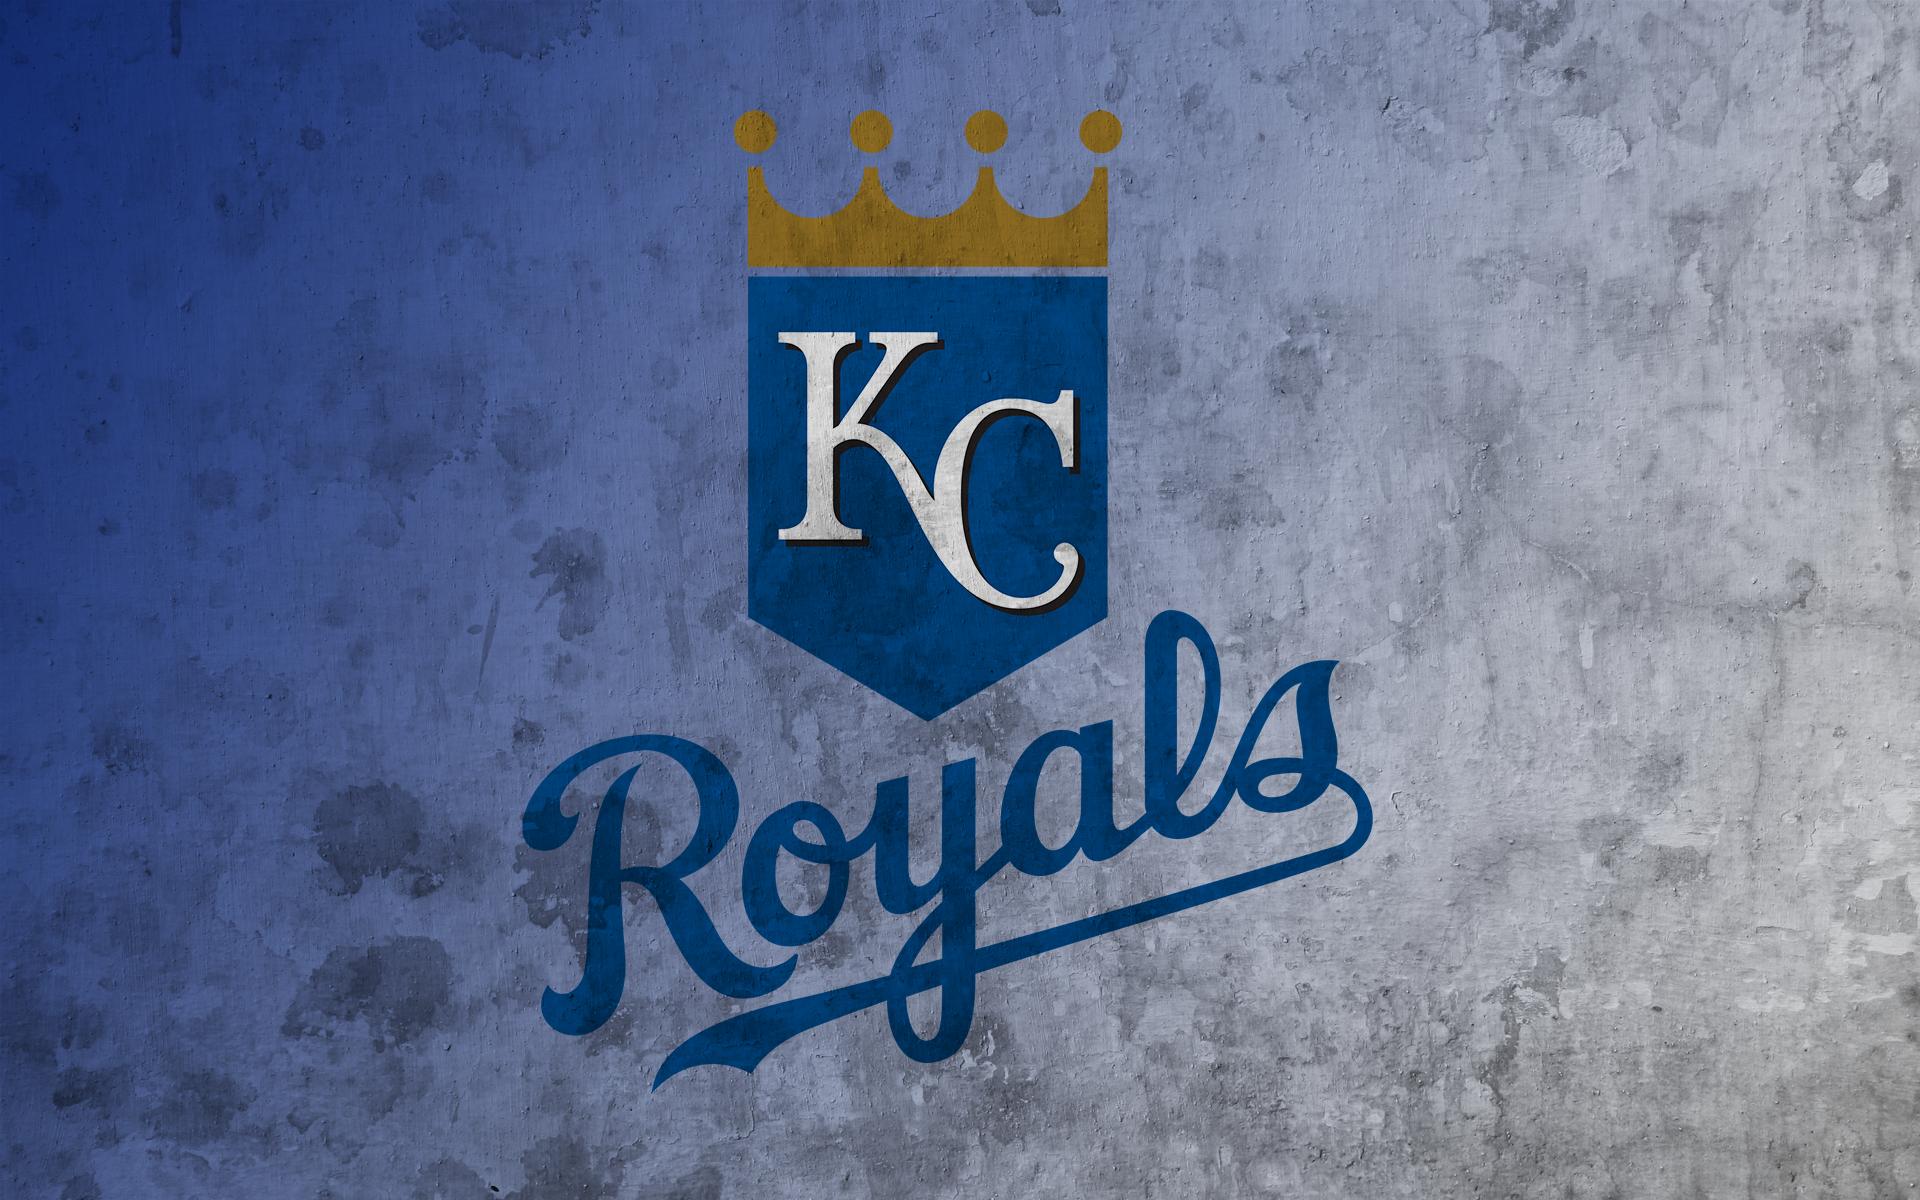 Kansas City Royals   1920x1200 Wallpaper   teahubio 1920x1200